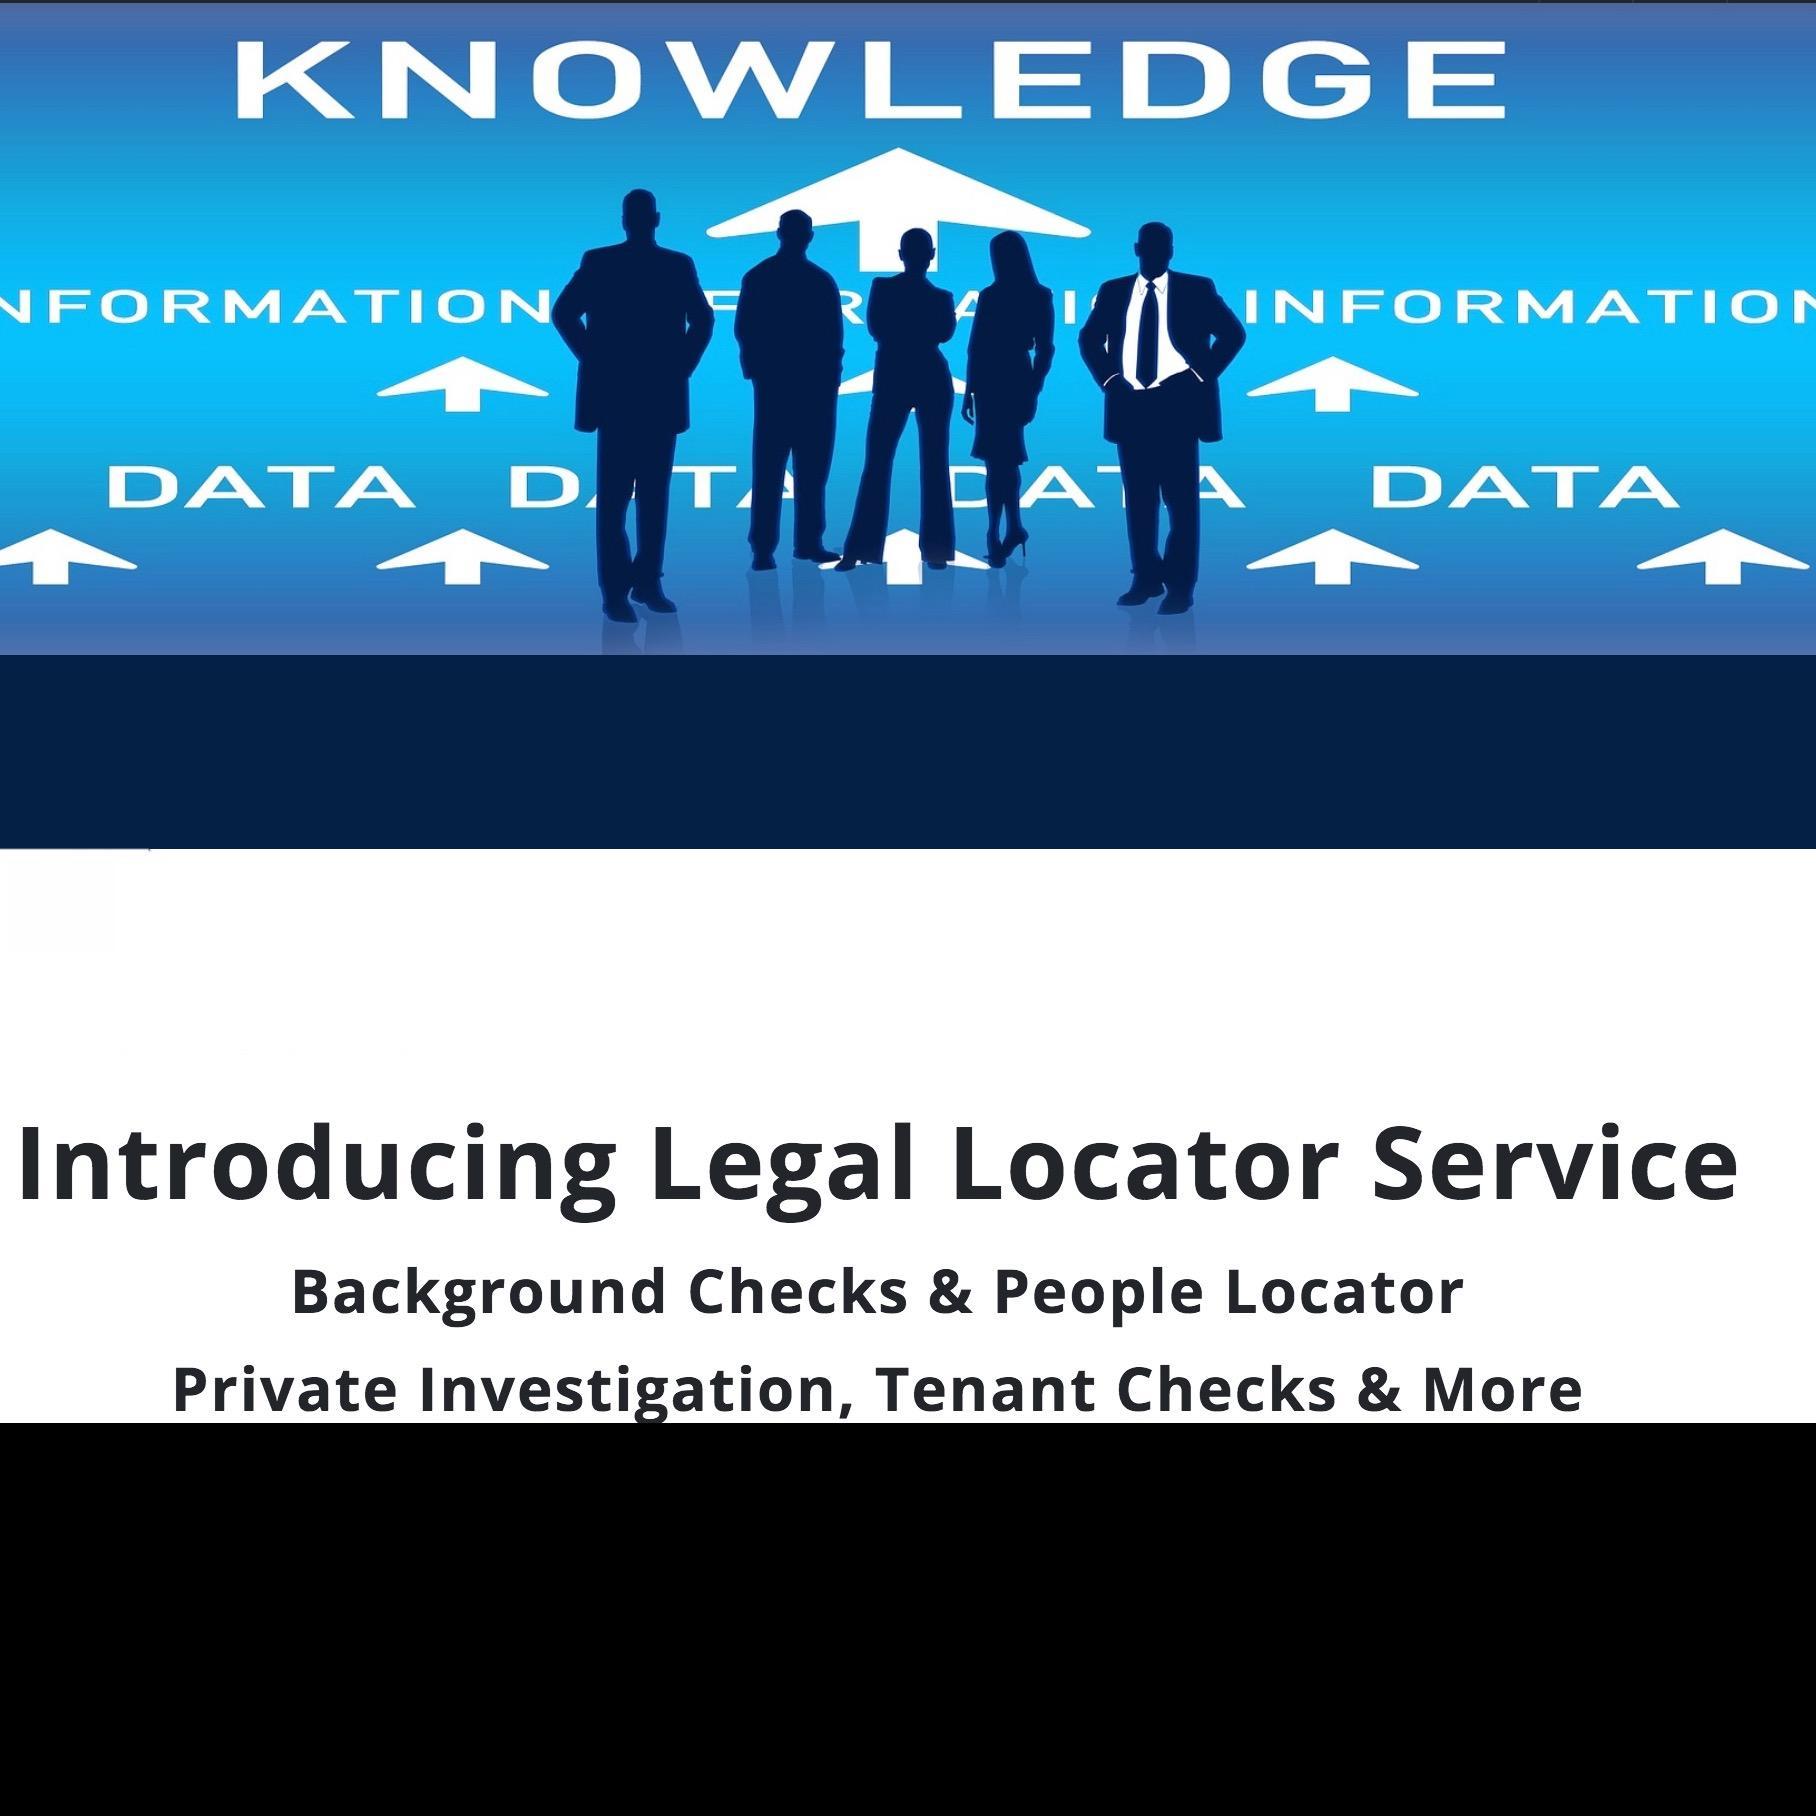 Legal Locator Service